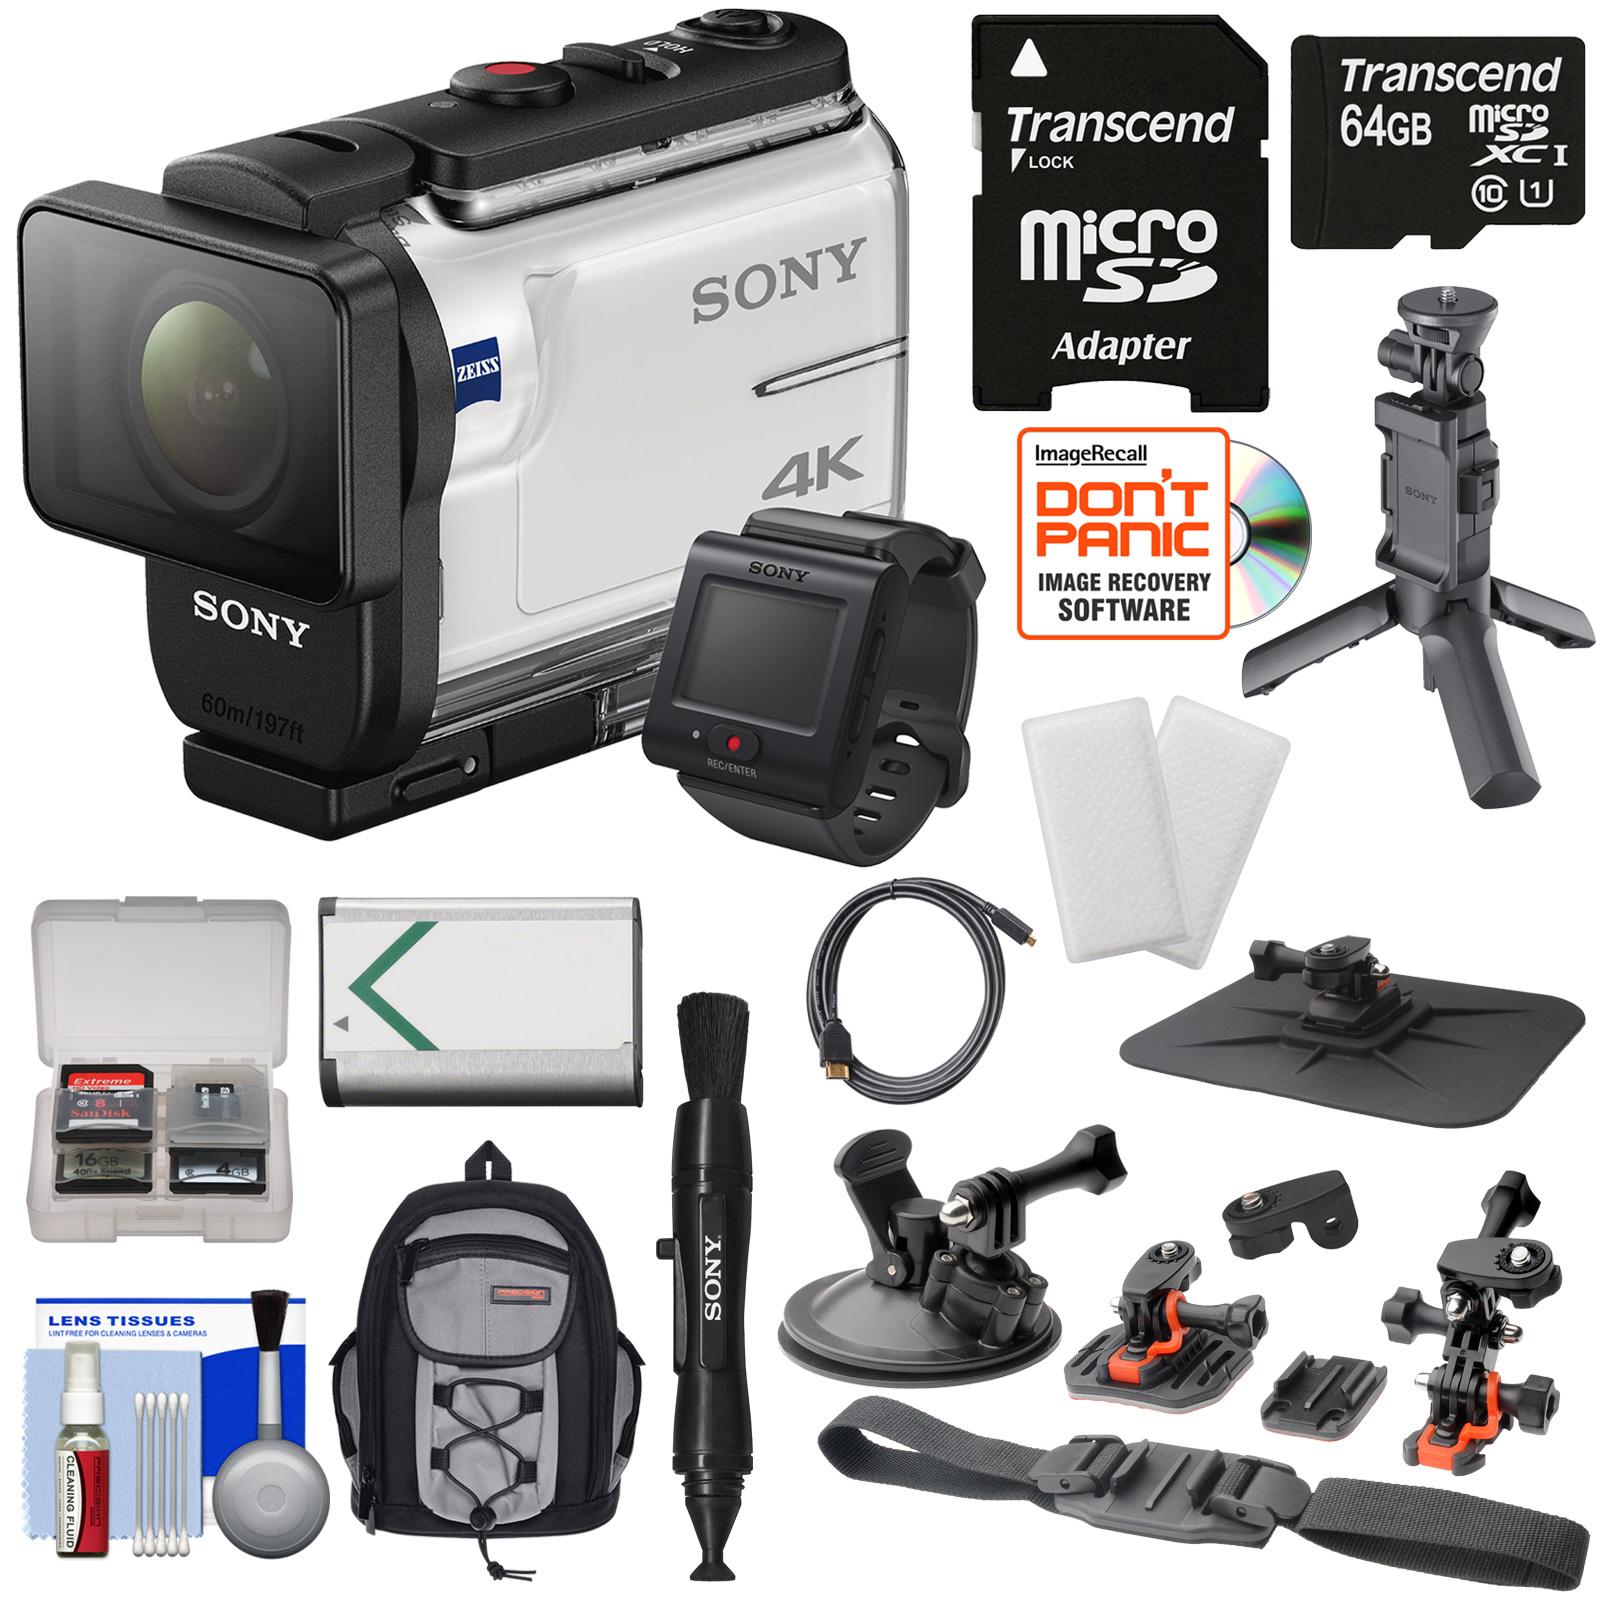 Sony Action Cam FDR-X3000R Wi-Fi GPS 4K HD Video Camera C...